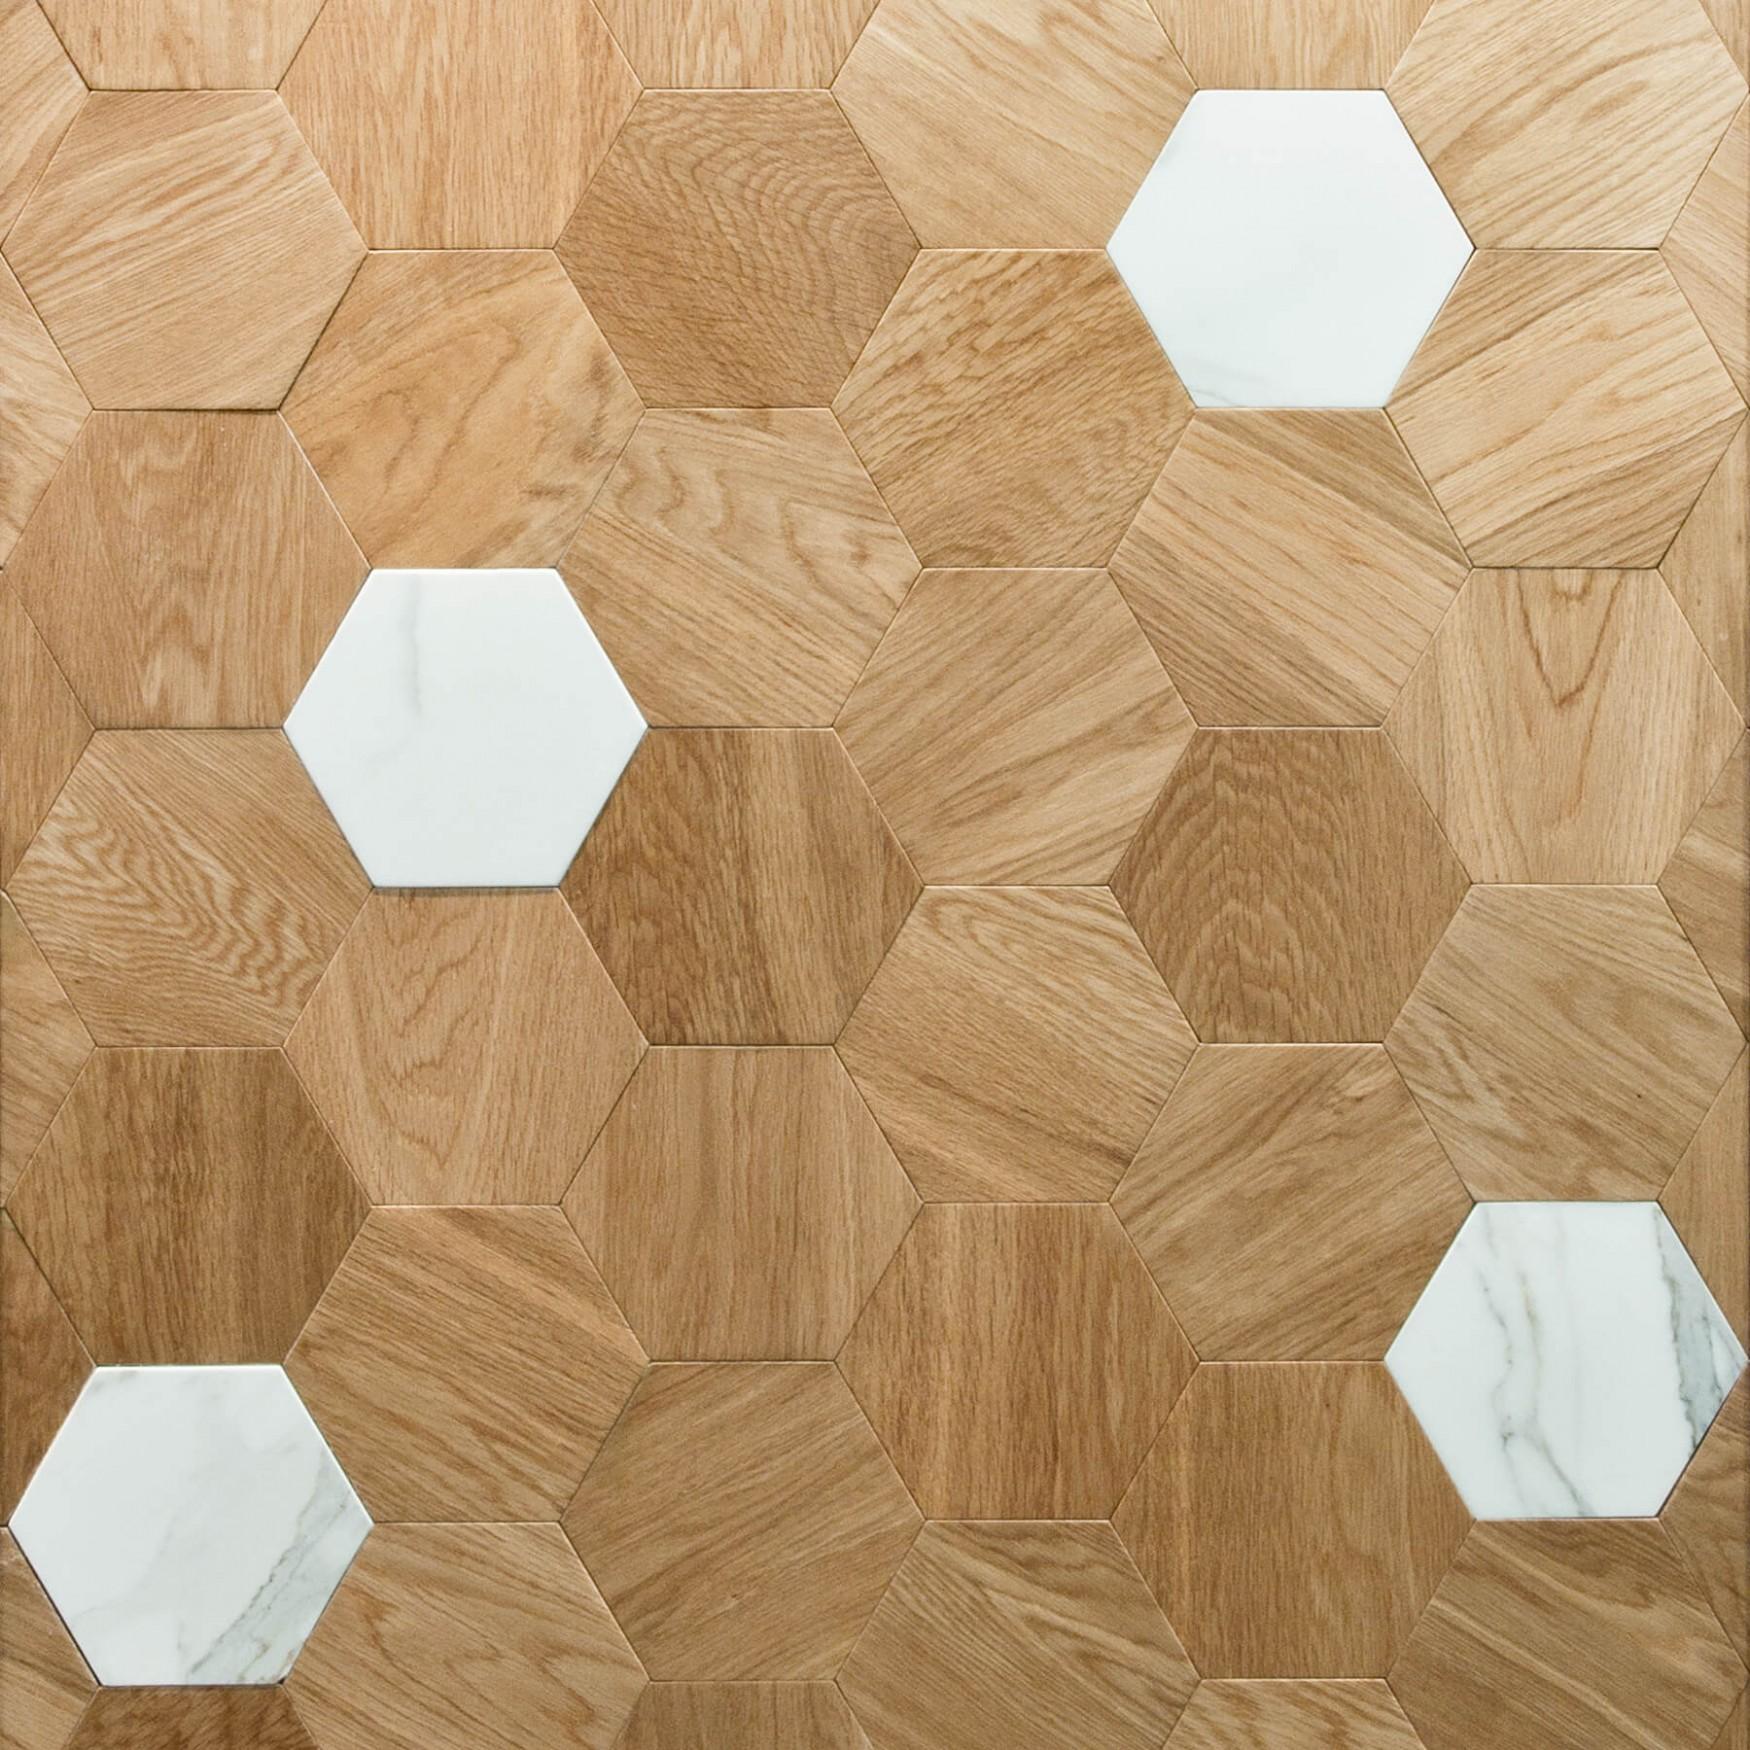 Element7-Bespoke-Floors-Esagoni_rovere_marmo